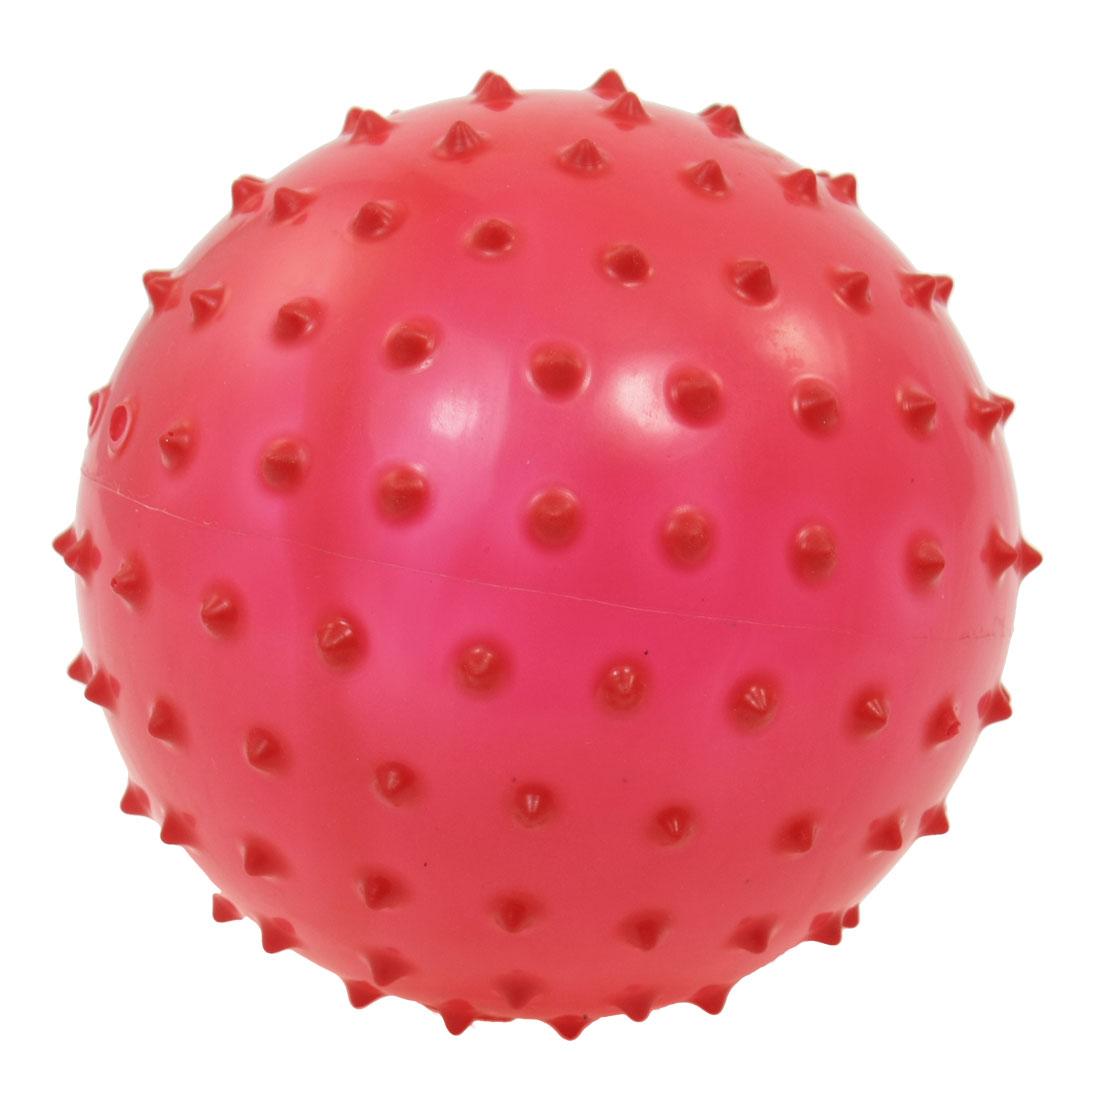 "5.5"" Diameter Body Fitness Stress Relief Spiky Massage Ball Dark Red"